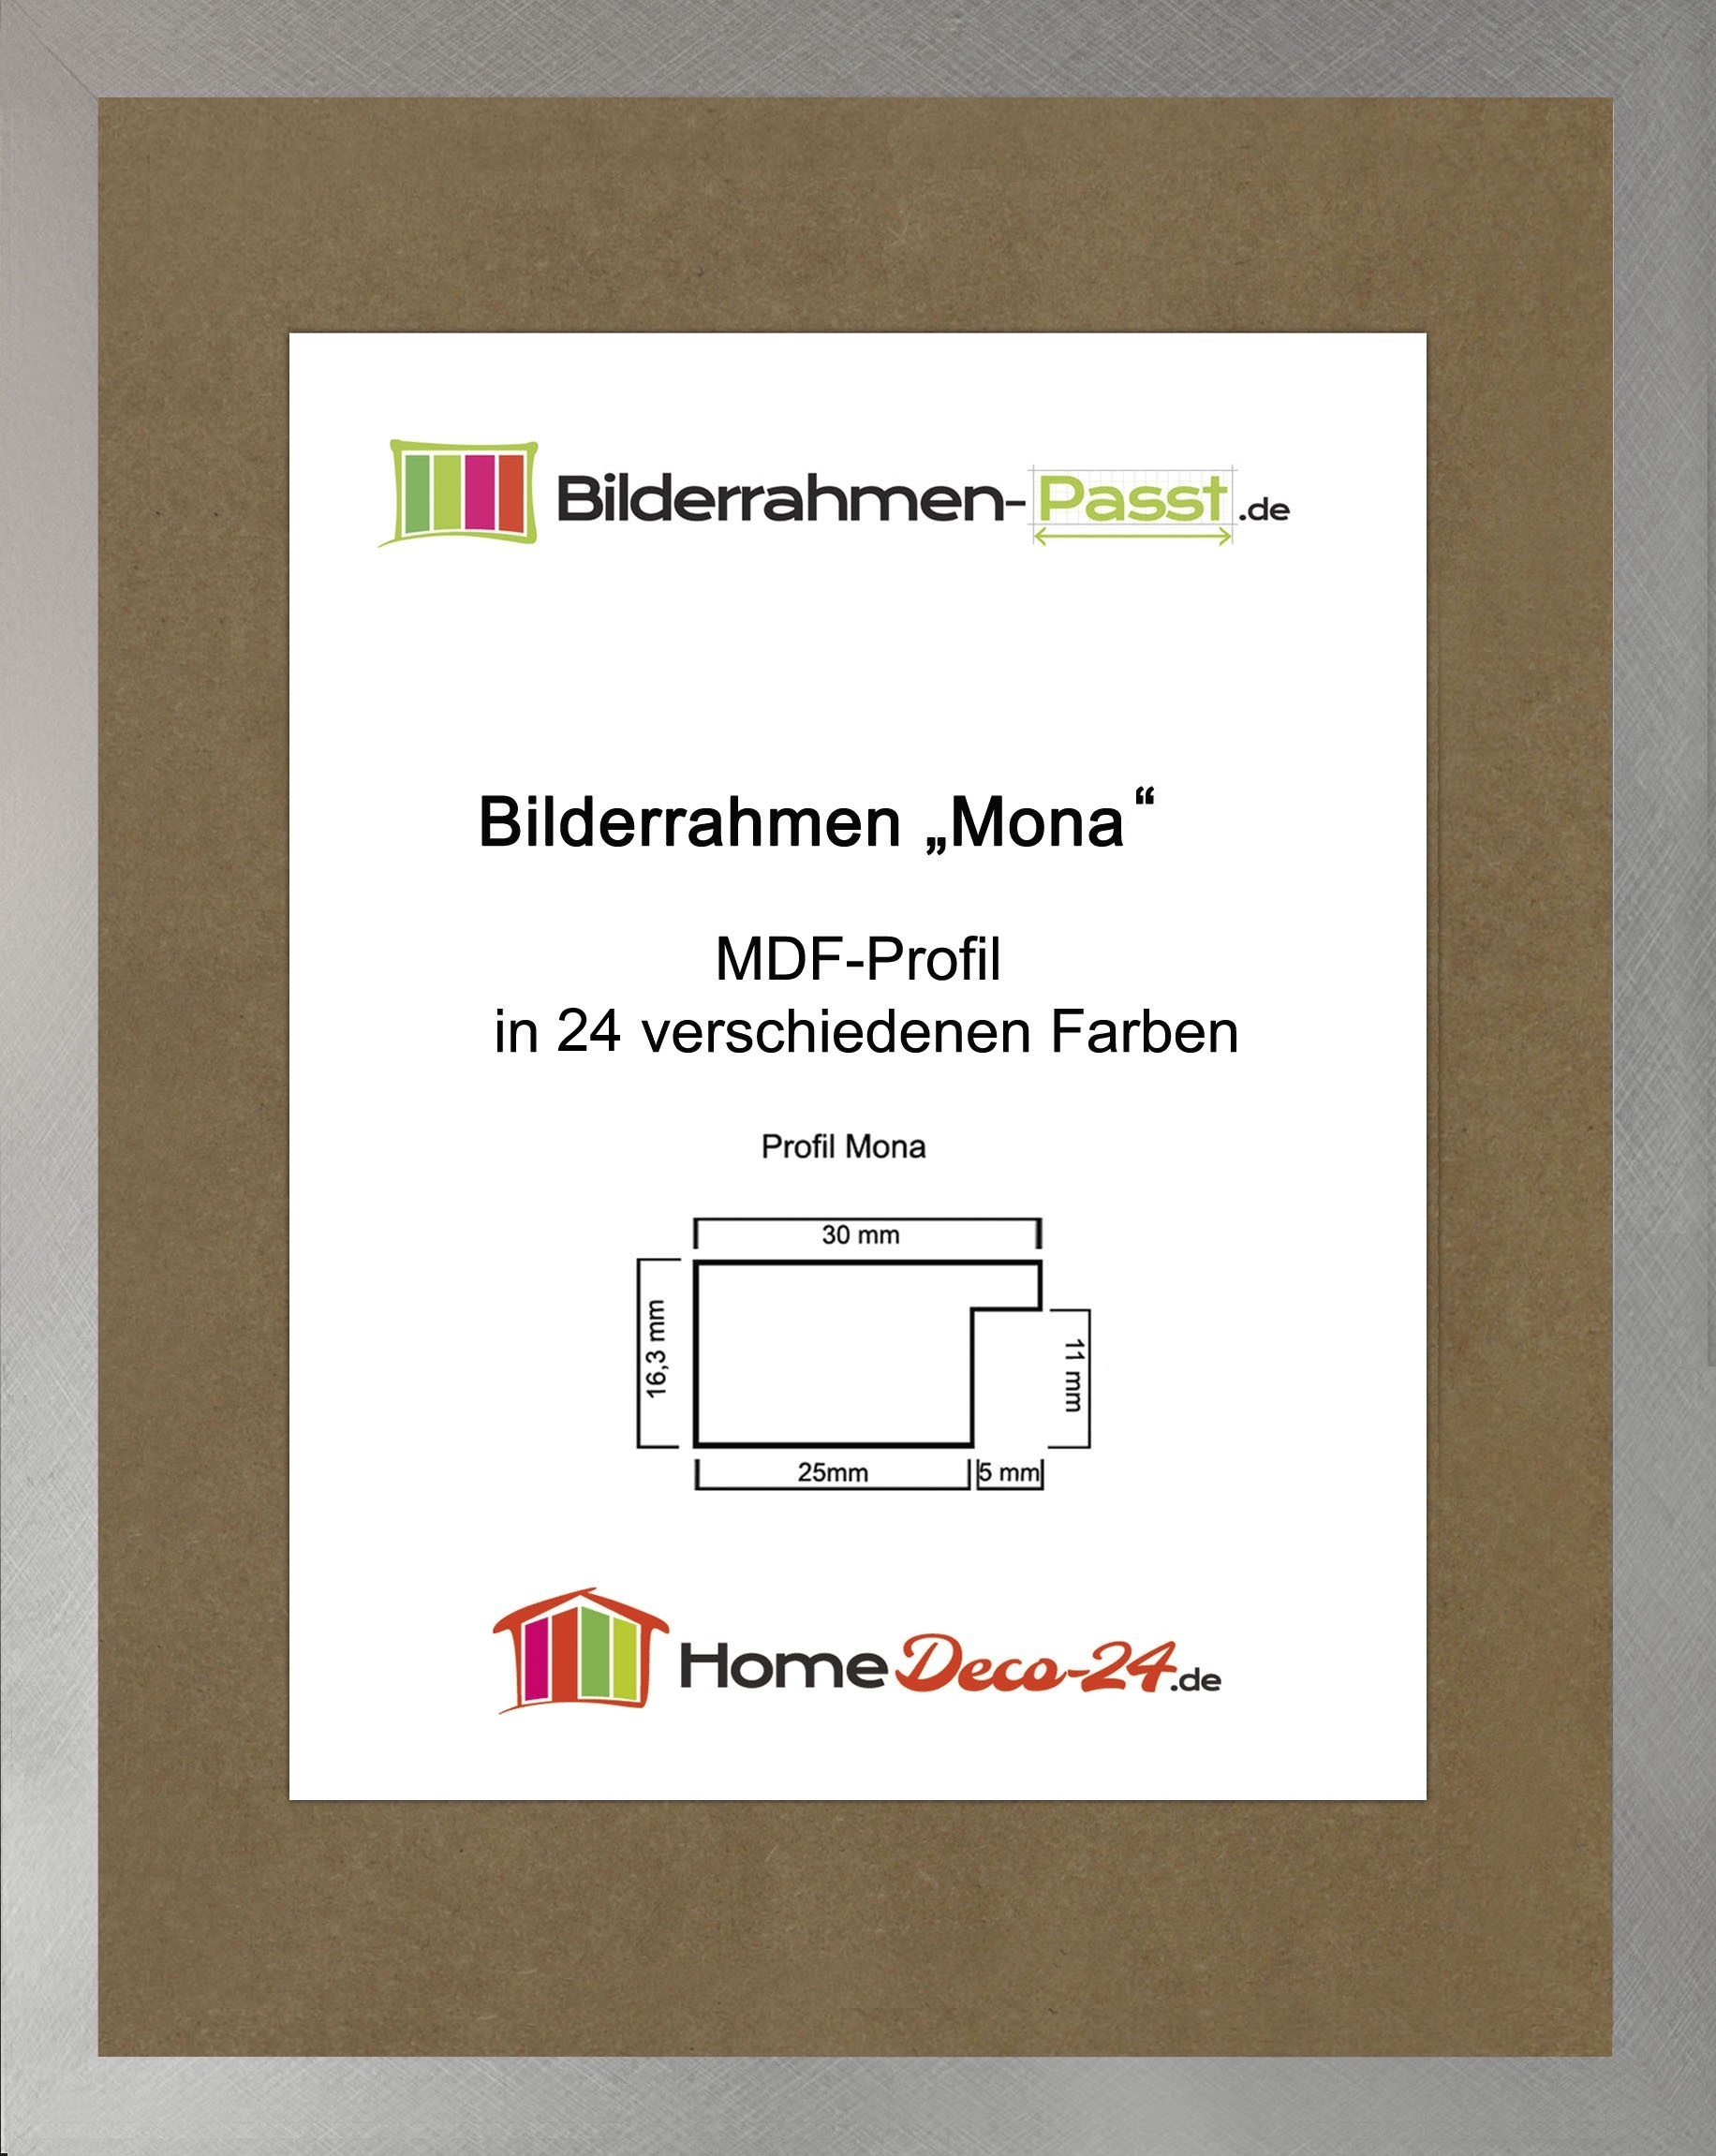 Mona 25 x 35 cm bilderrahmen homedeco 24 holzwerkstoff for Home deco 24